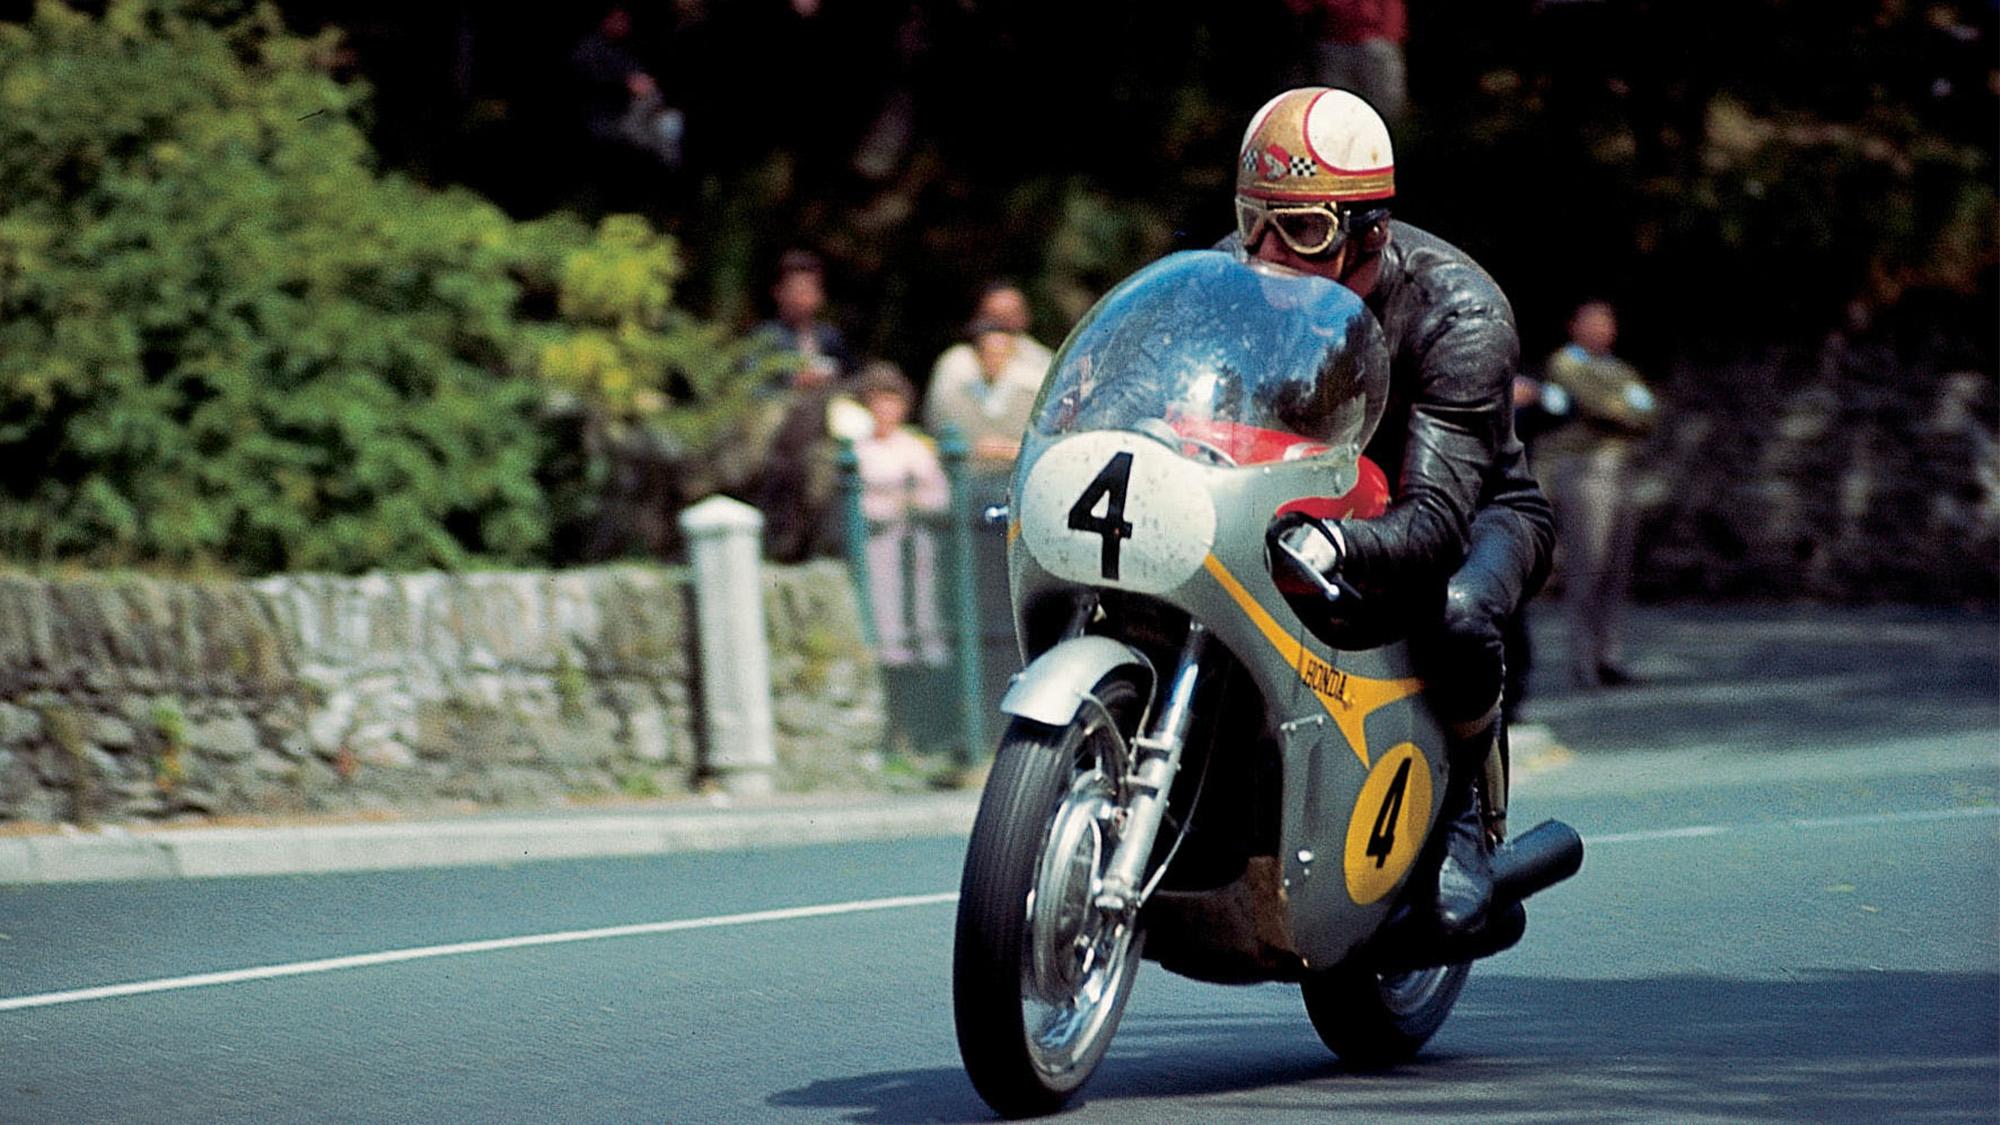 Mike Hailwood at the 1967 Isle of Man TT